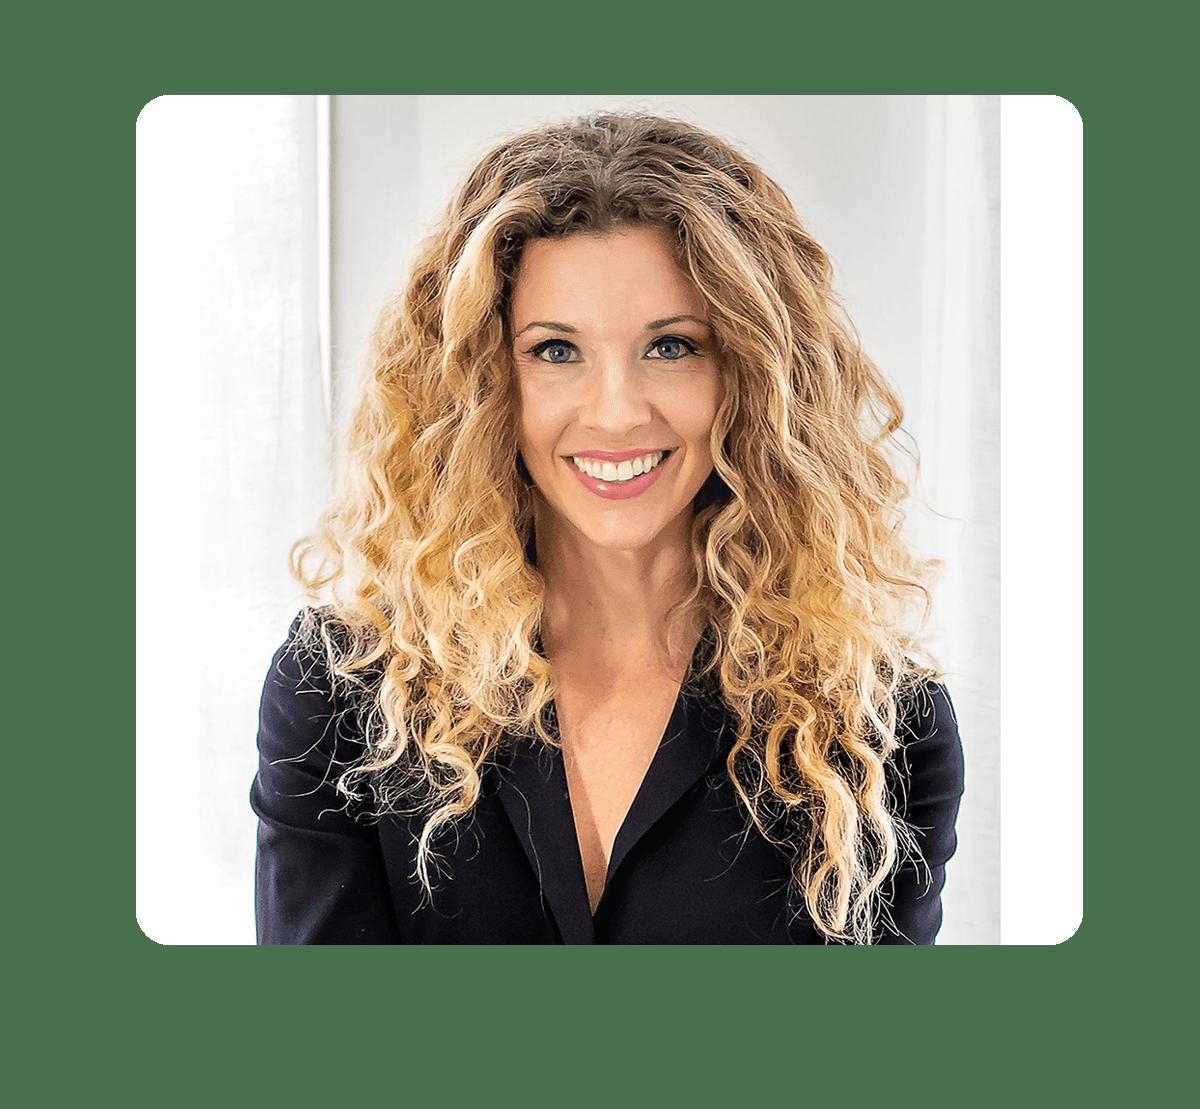 Kirsten Thompson, M.D. - certified psychiatrist